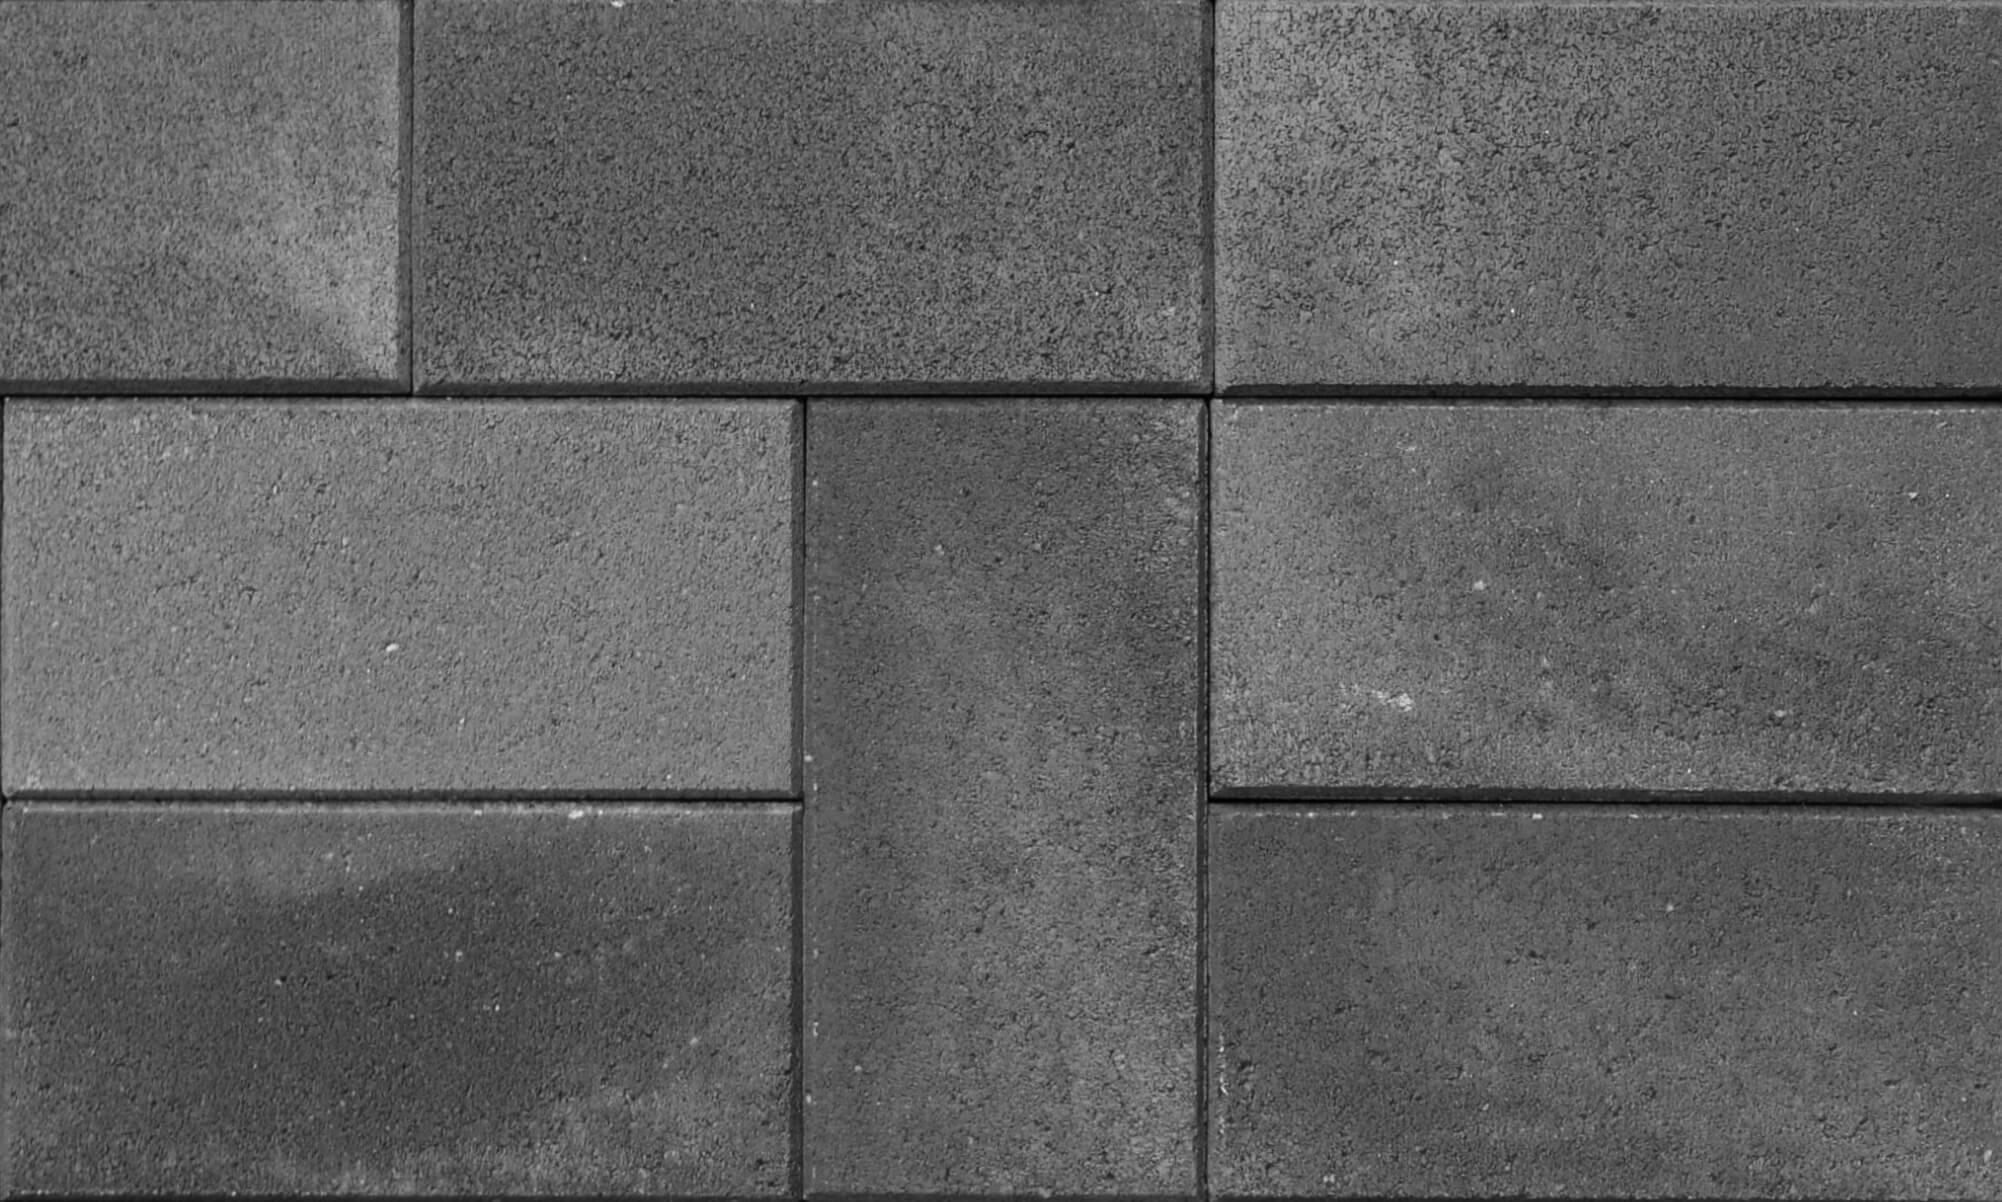 Arrancar Ropa Porn evolution in production pallets for concrete blocks - rhino